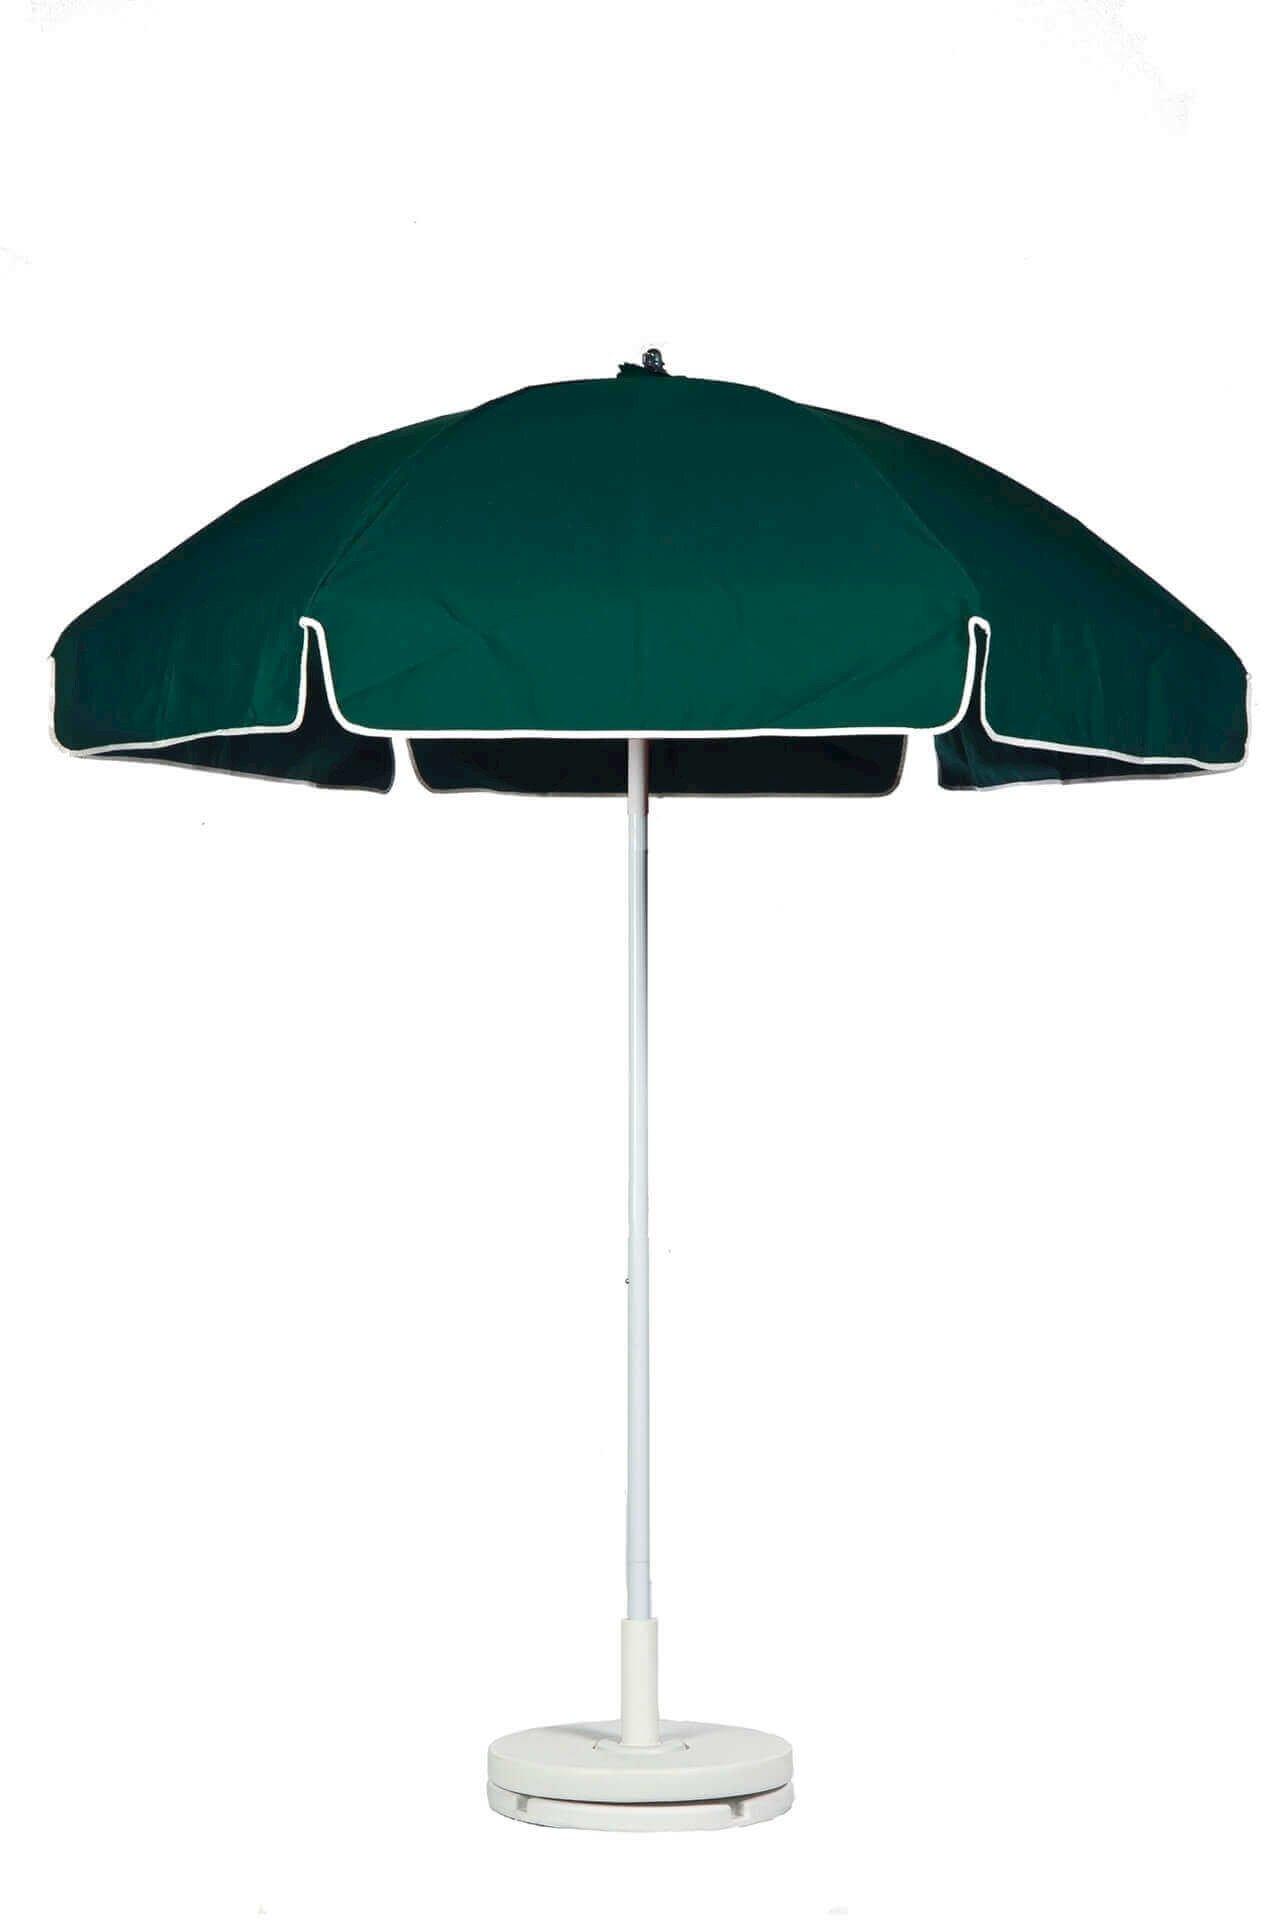 6 5 foot acrylic lifeguard printed umbrella furniture leisure. Black Bedroom Furniture Sets. Home Design Ideas